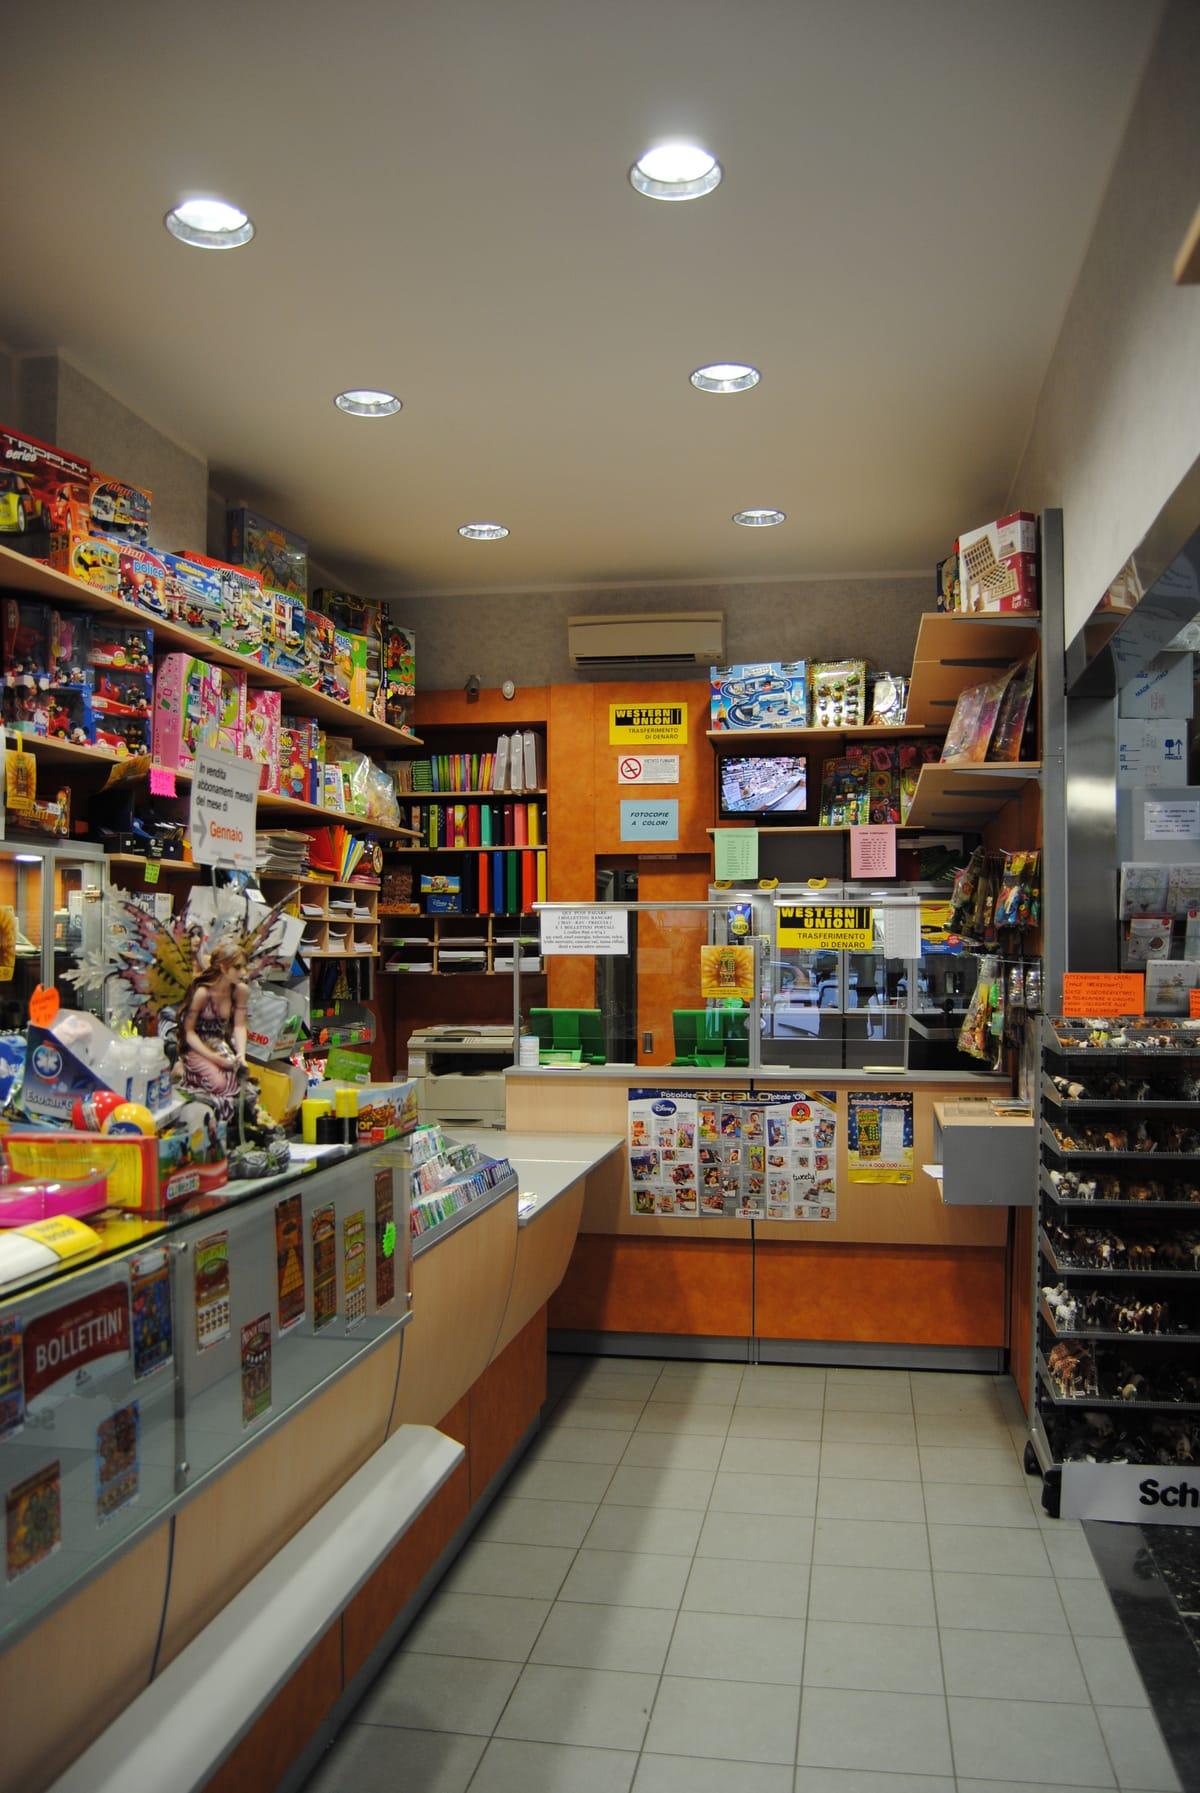 Arredamento tabaccheria genova surgea for Arredamento negozi genova